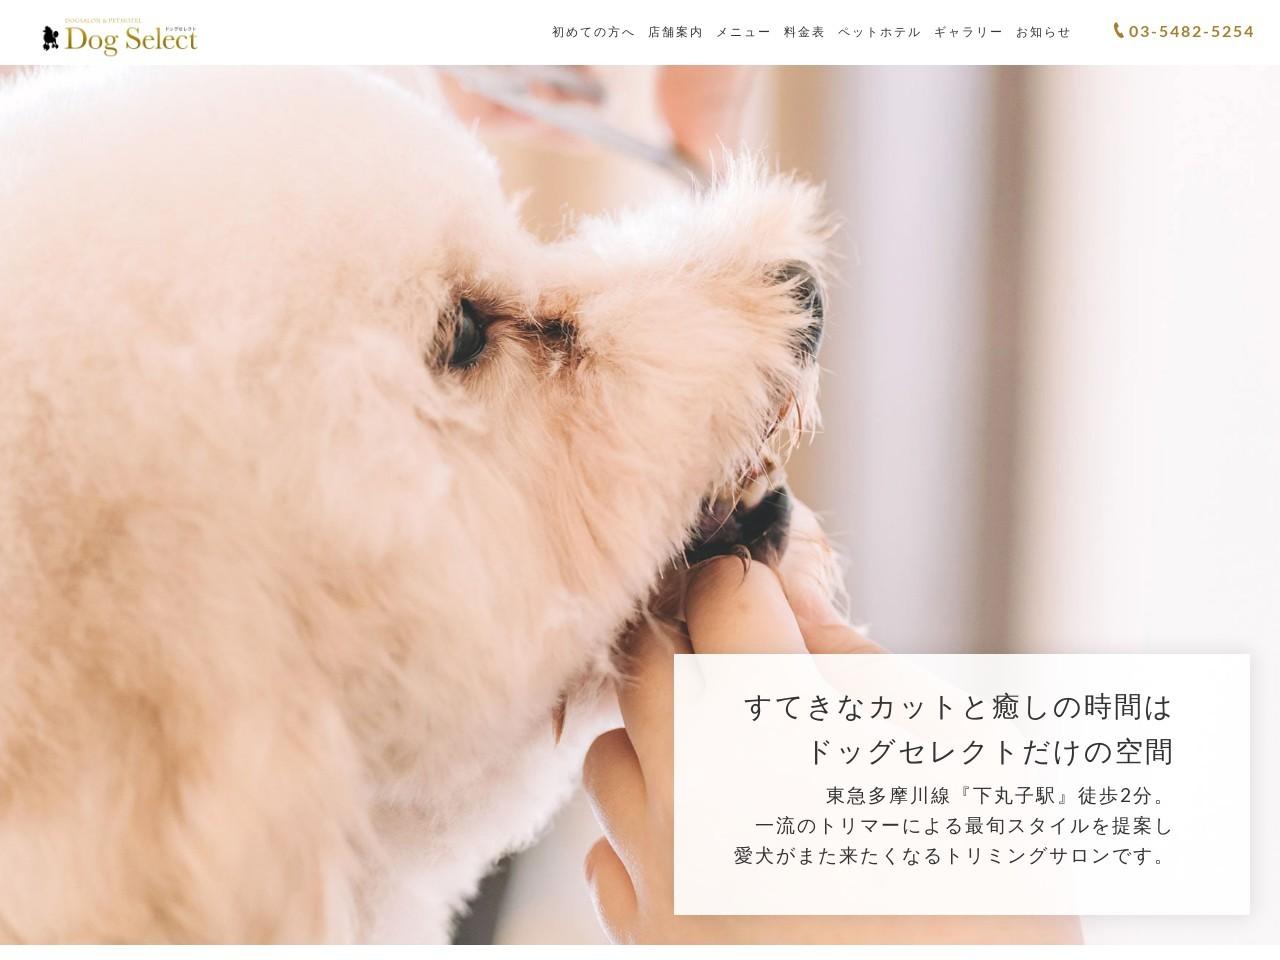 DogSelect